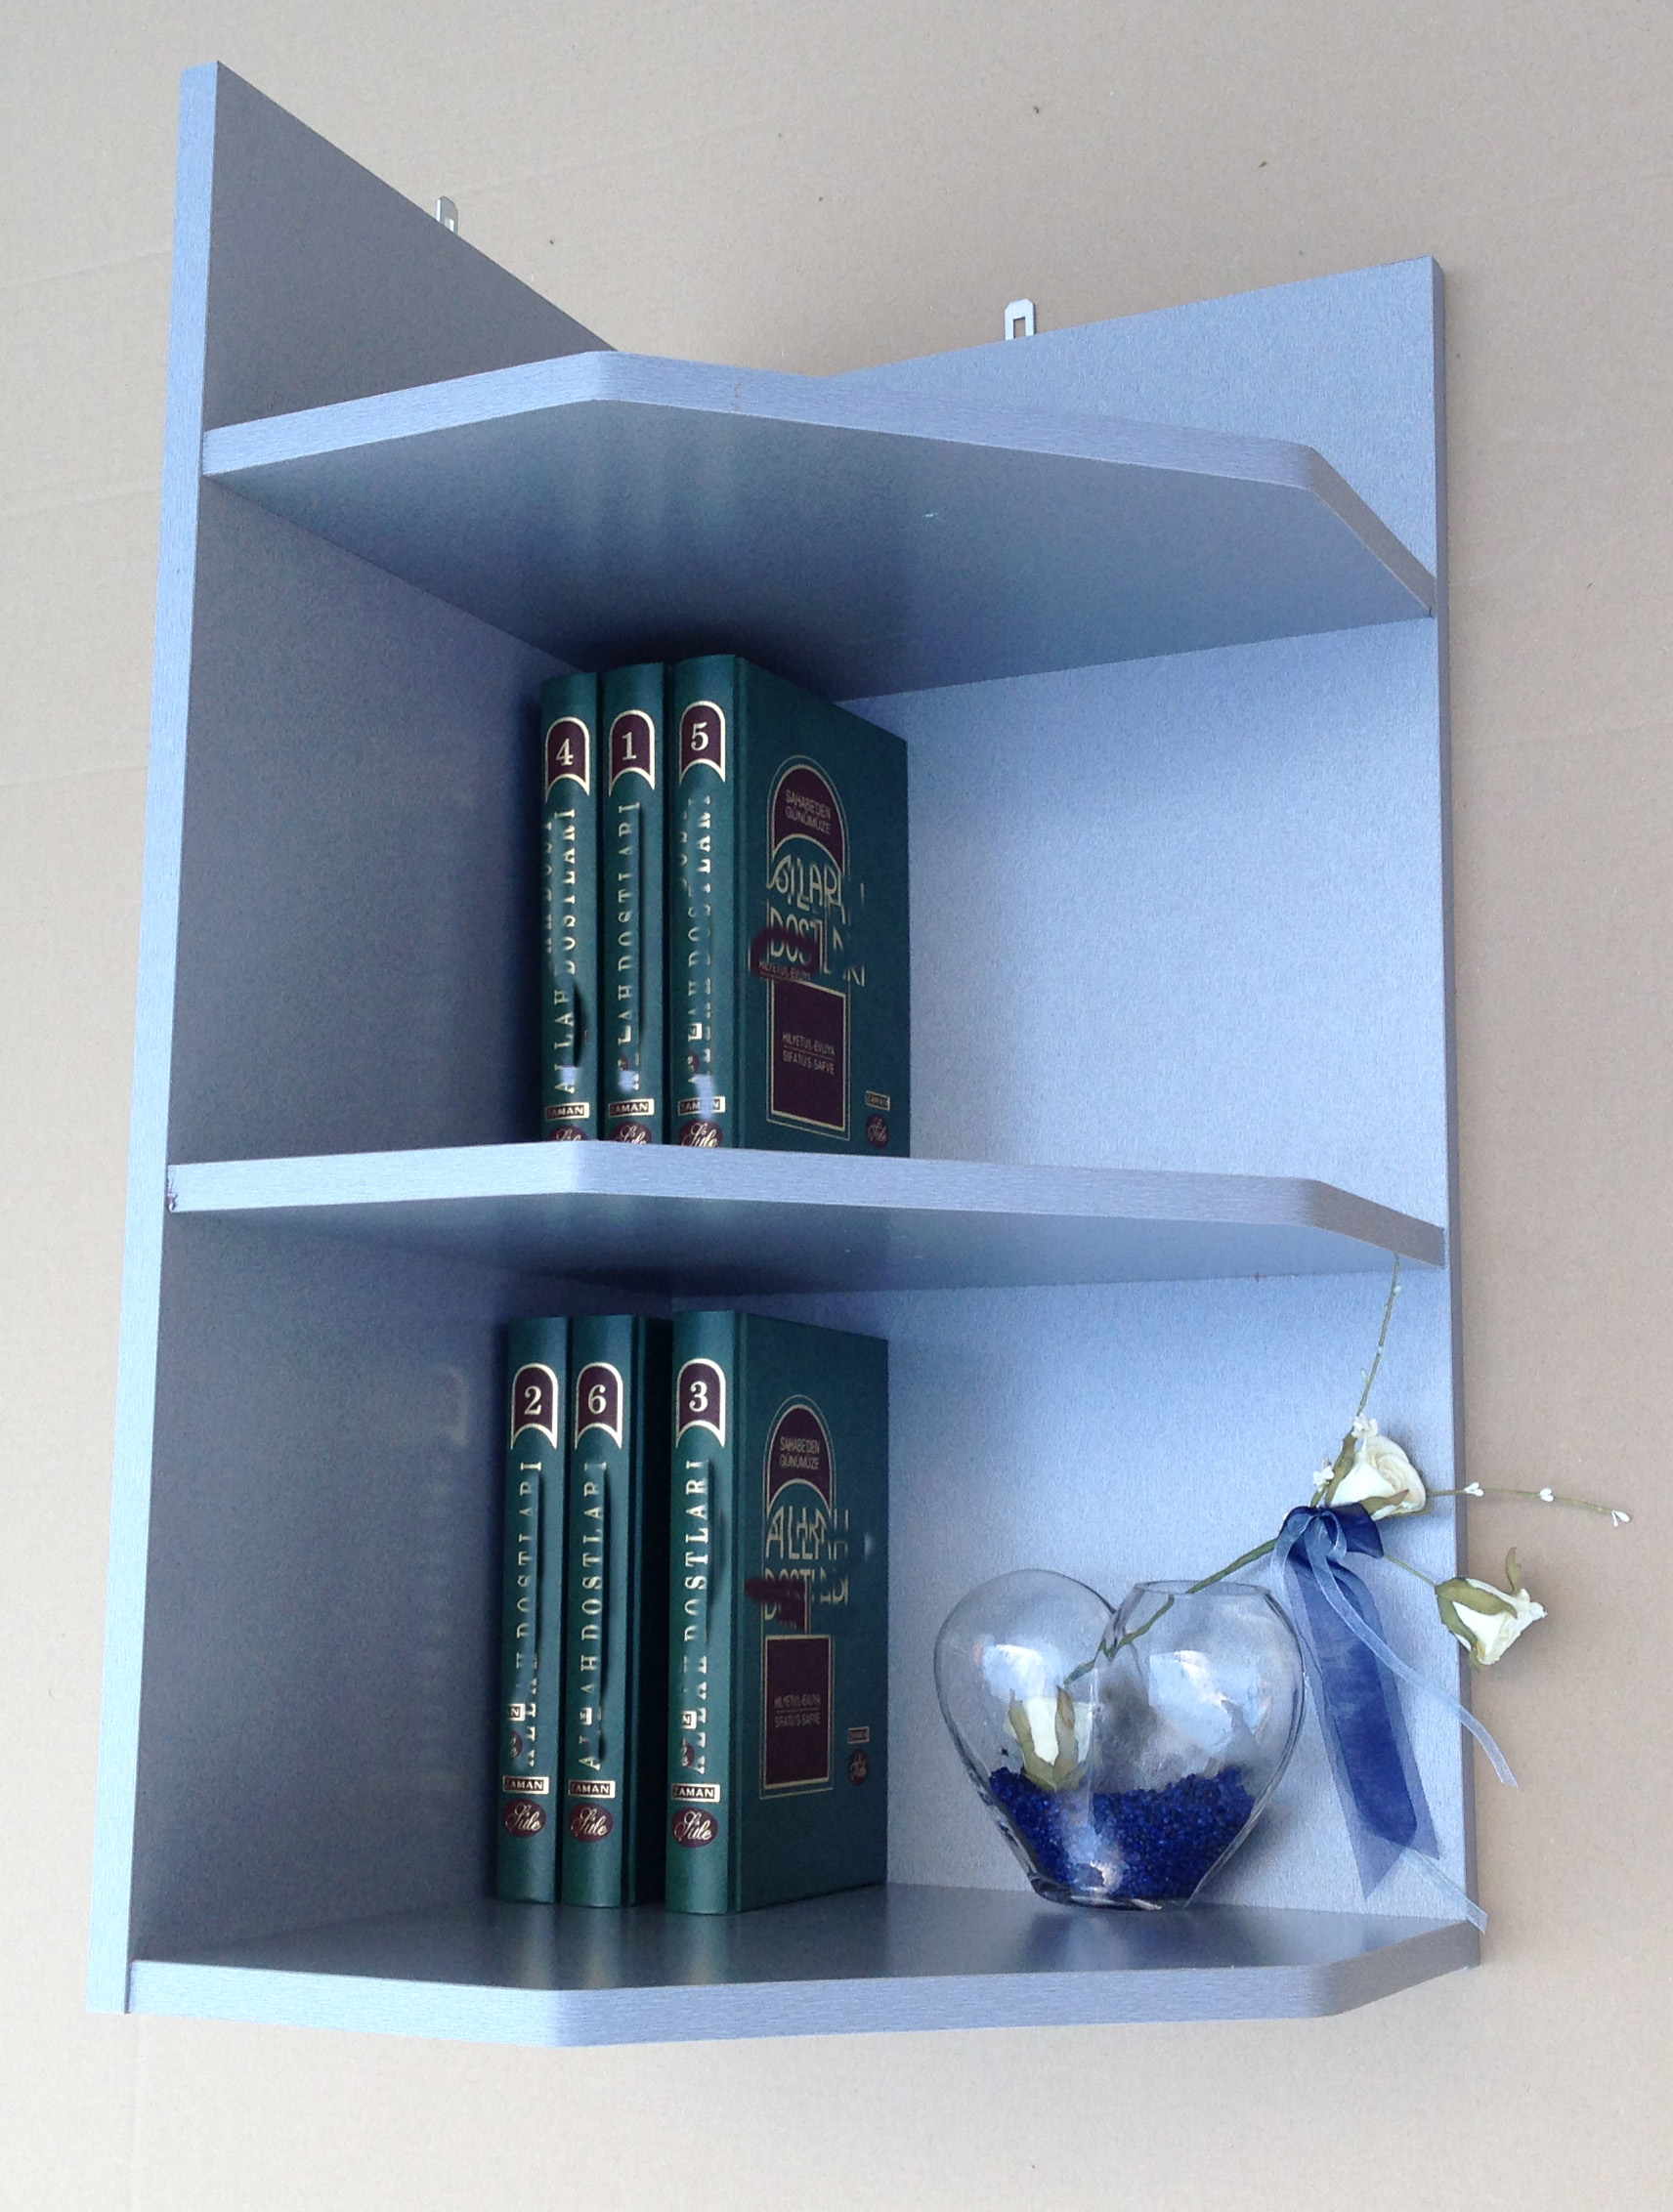 eckregal wandregal b cherregal regal mod r462 blau kiefer. Black Bedroom Furniture Sets. Home Design Ideas